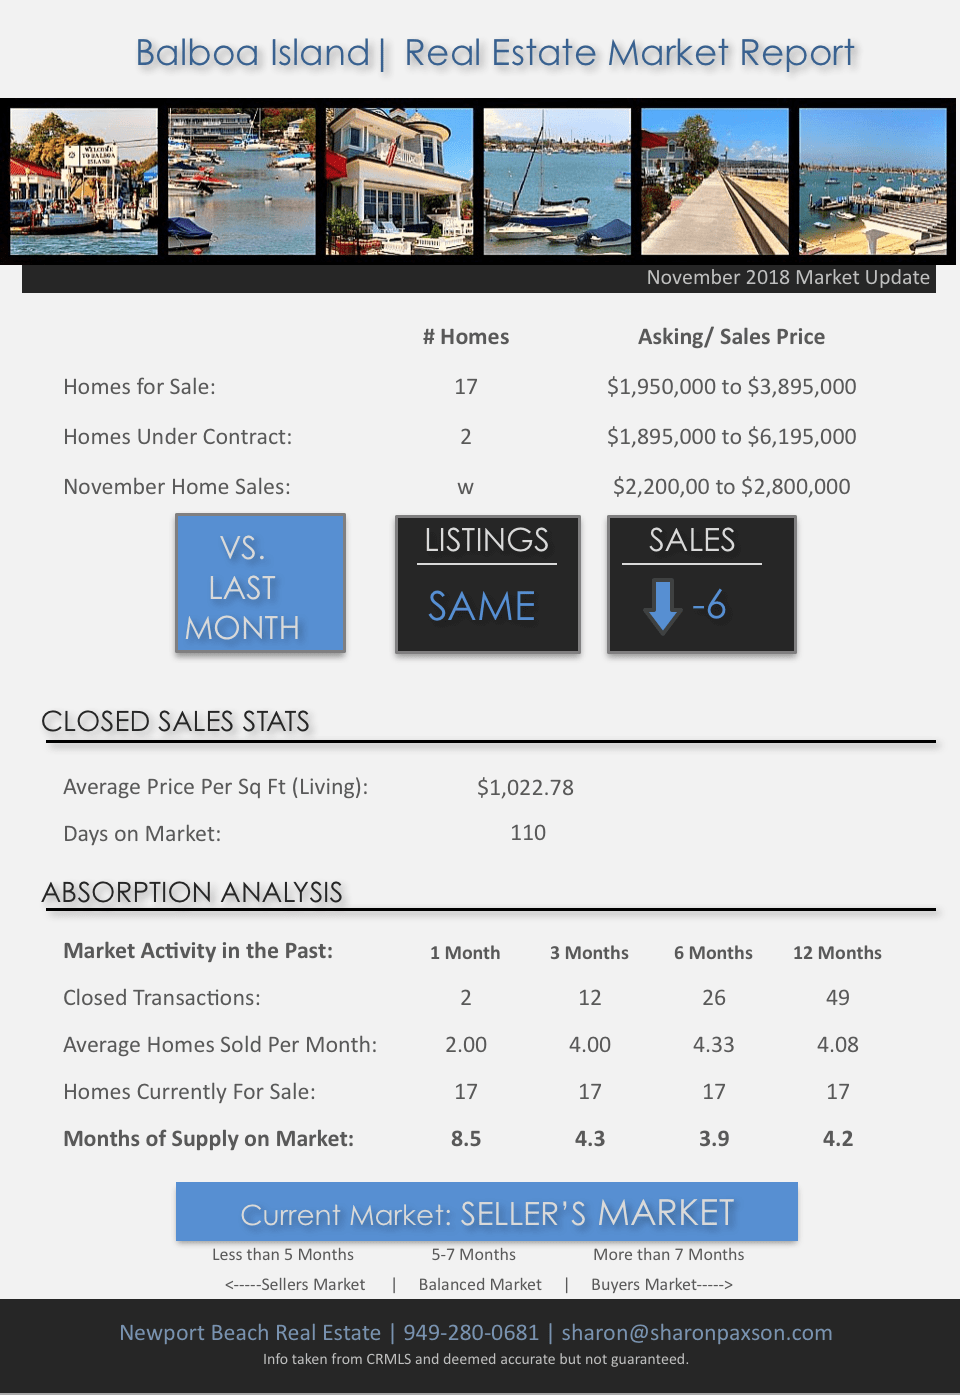 How\'s the Real Estate Market on Balboa Island Newport Beach November 2018?